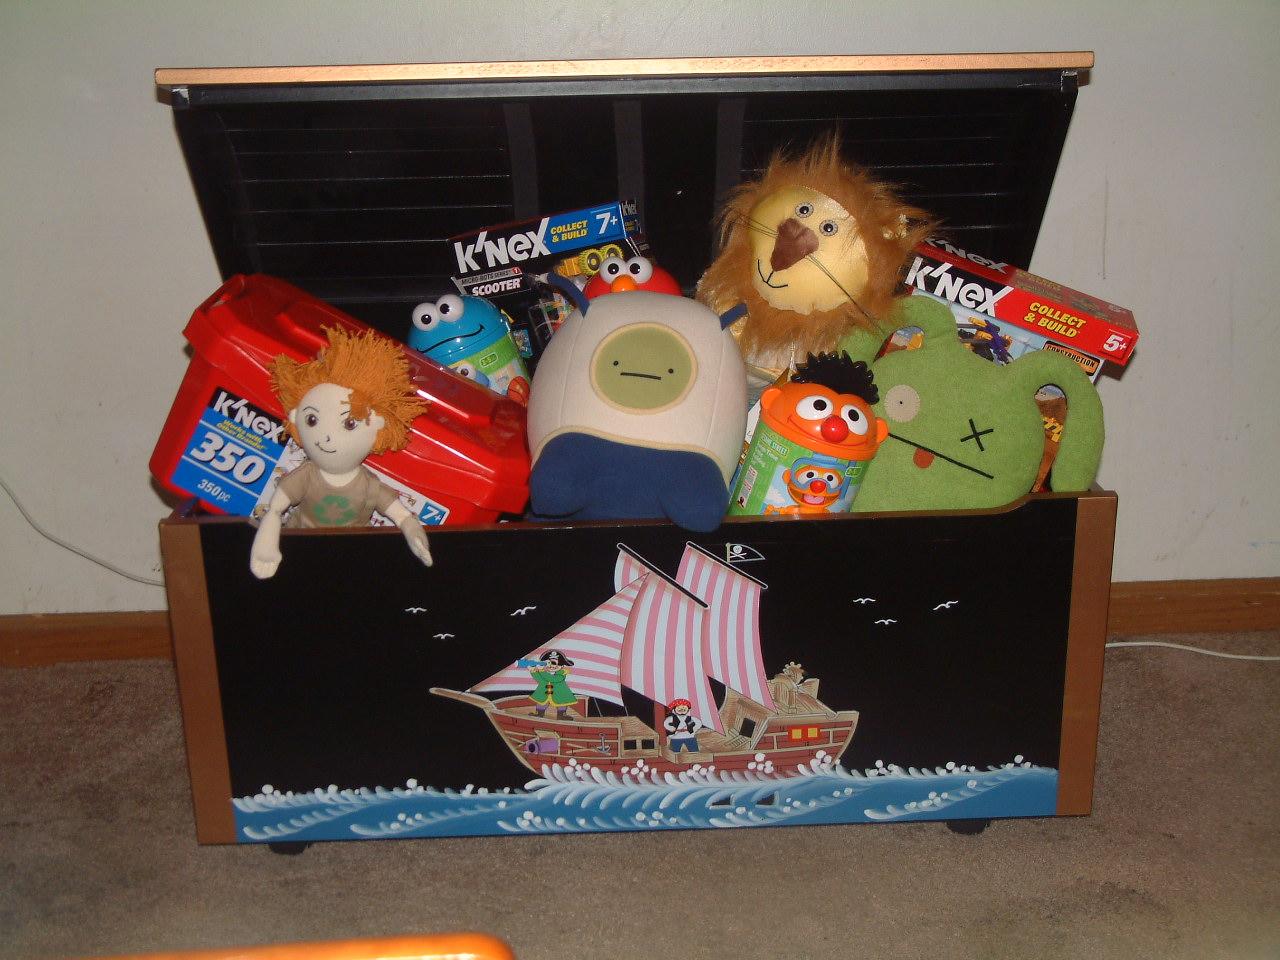 Toy Treasure Chest Beach : Bizzimommi s guidecraft pirate treasure chest toy